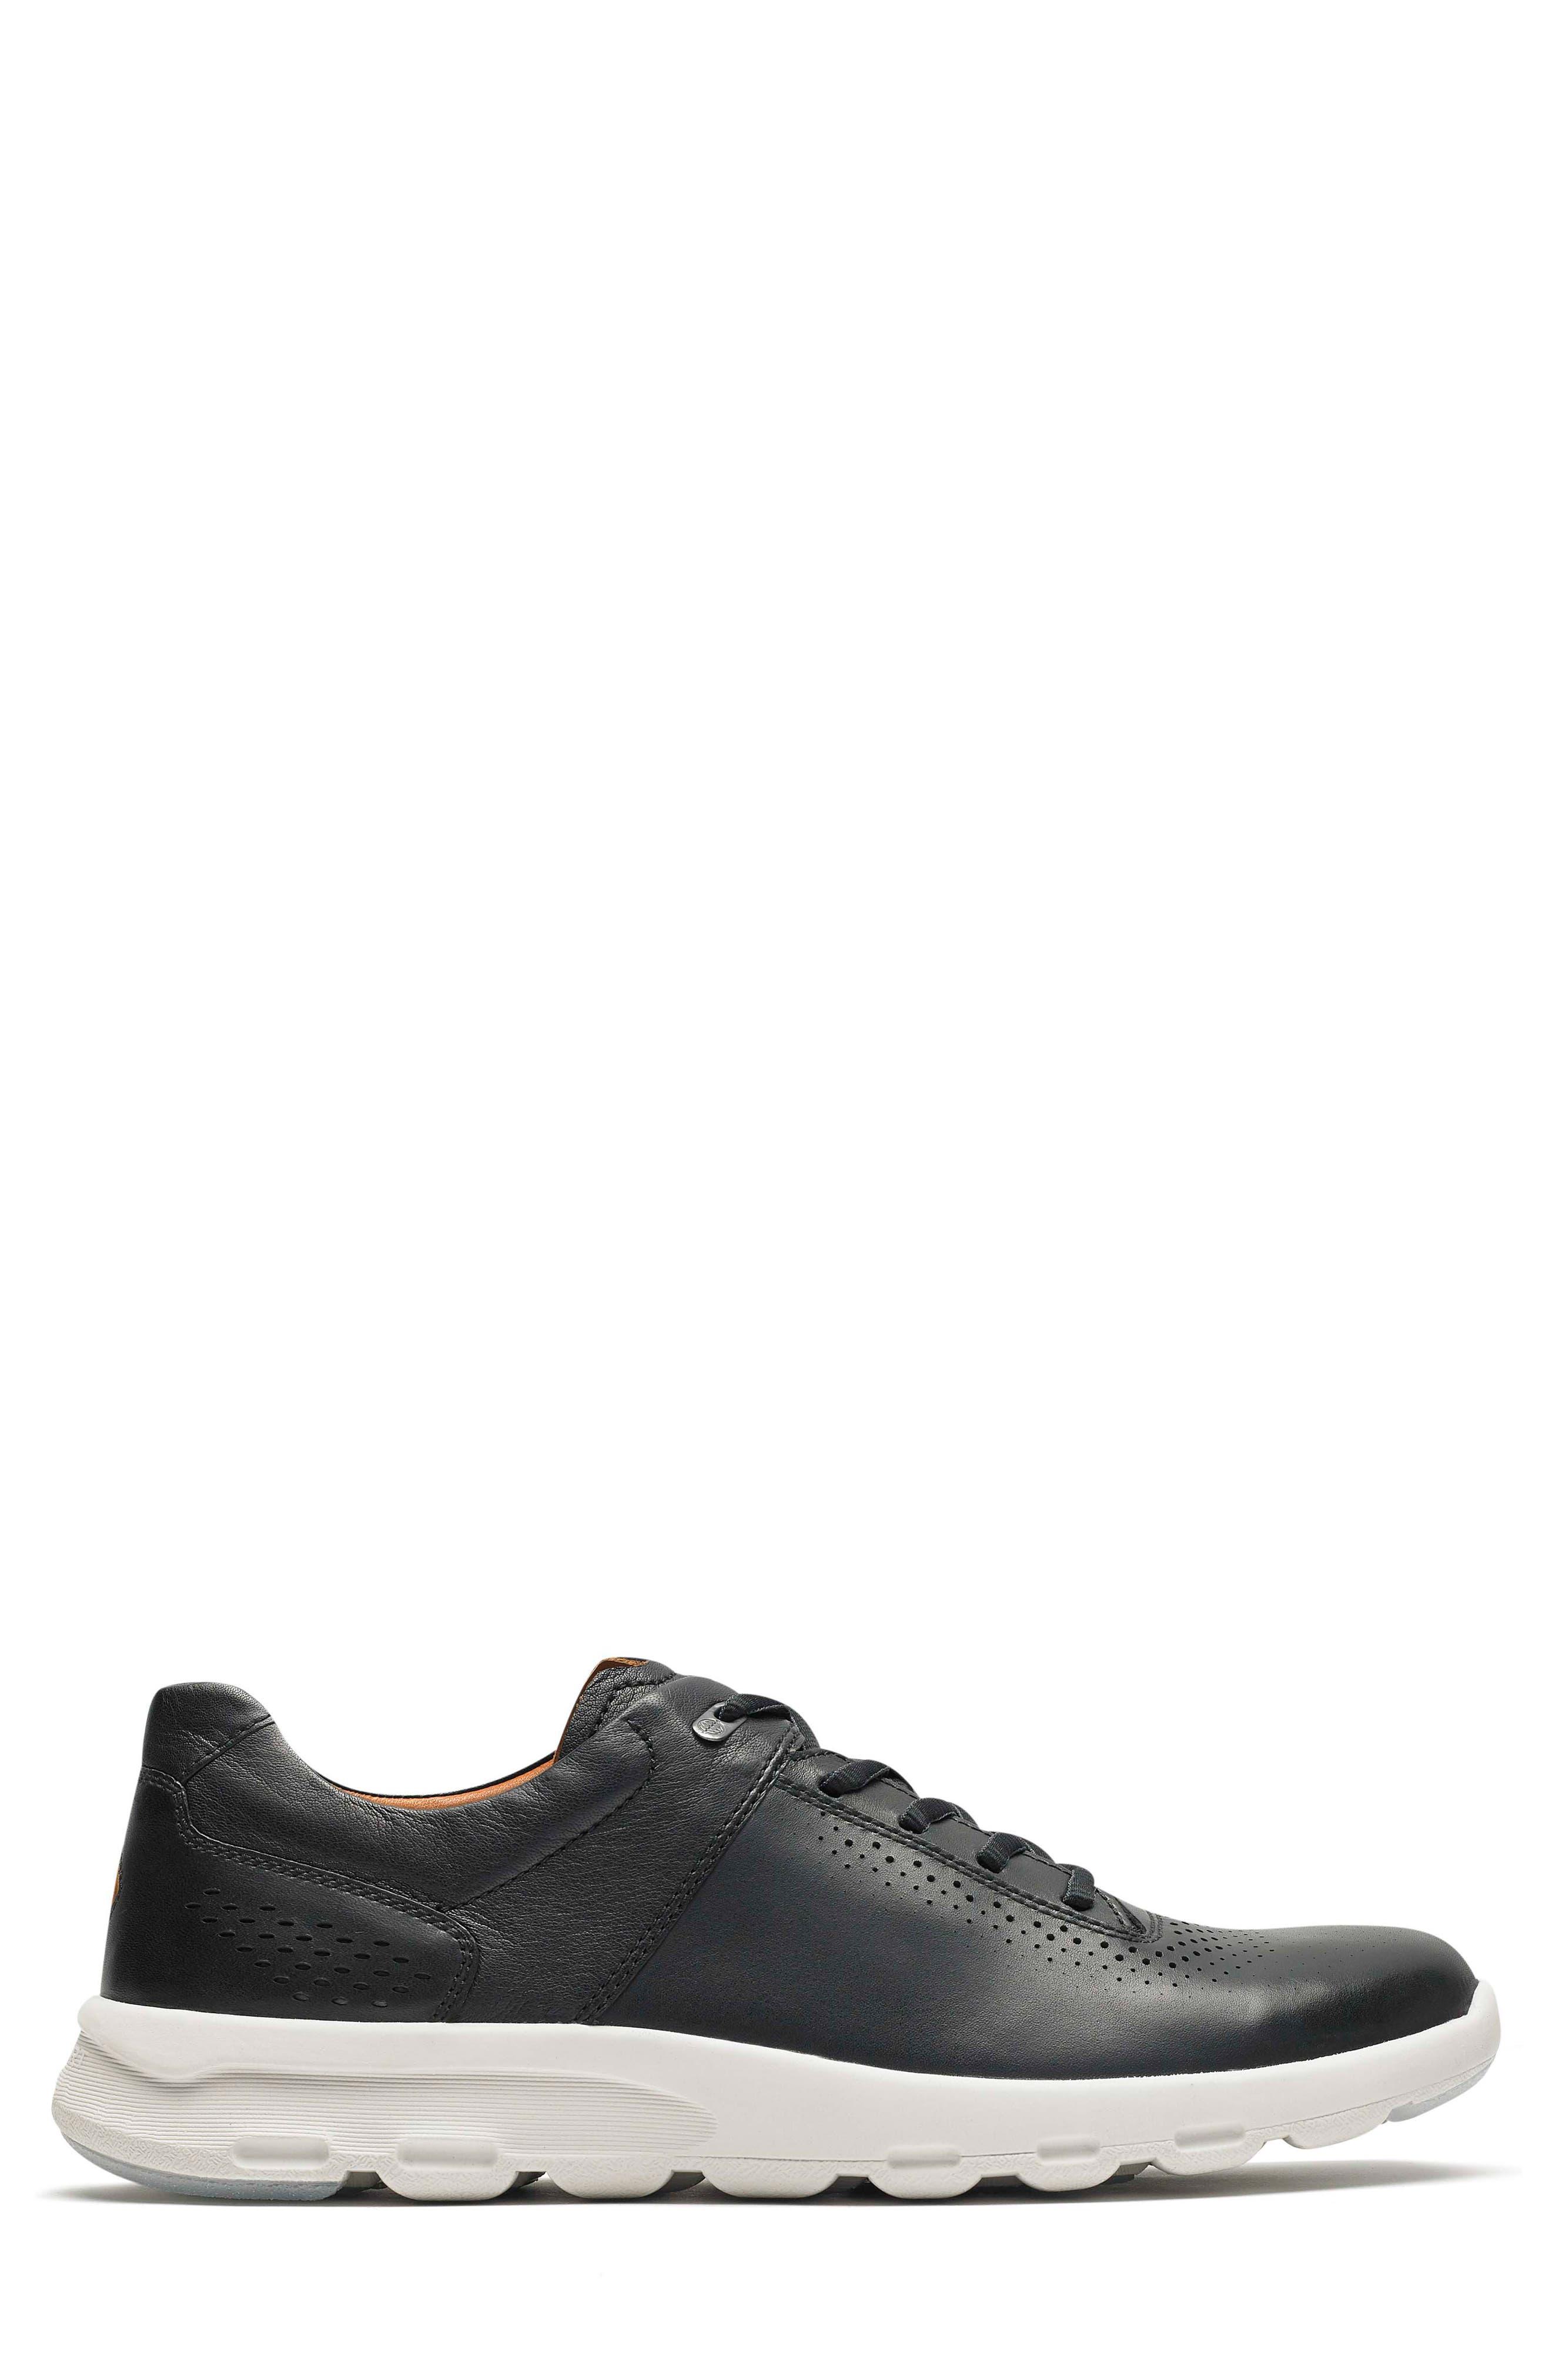 Let's Walk<sup>®</sup> Sneaker,                             Alternate thumbnail 3, color,                             BLACK LEATHER